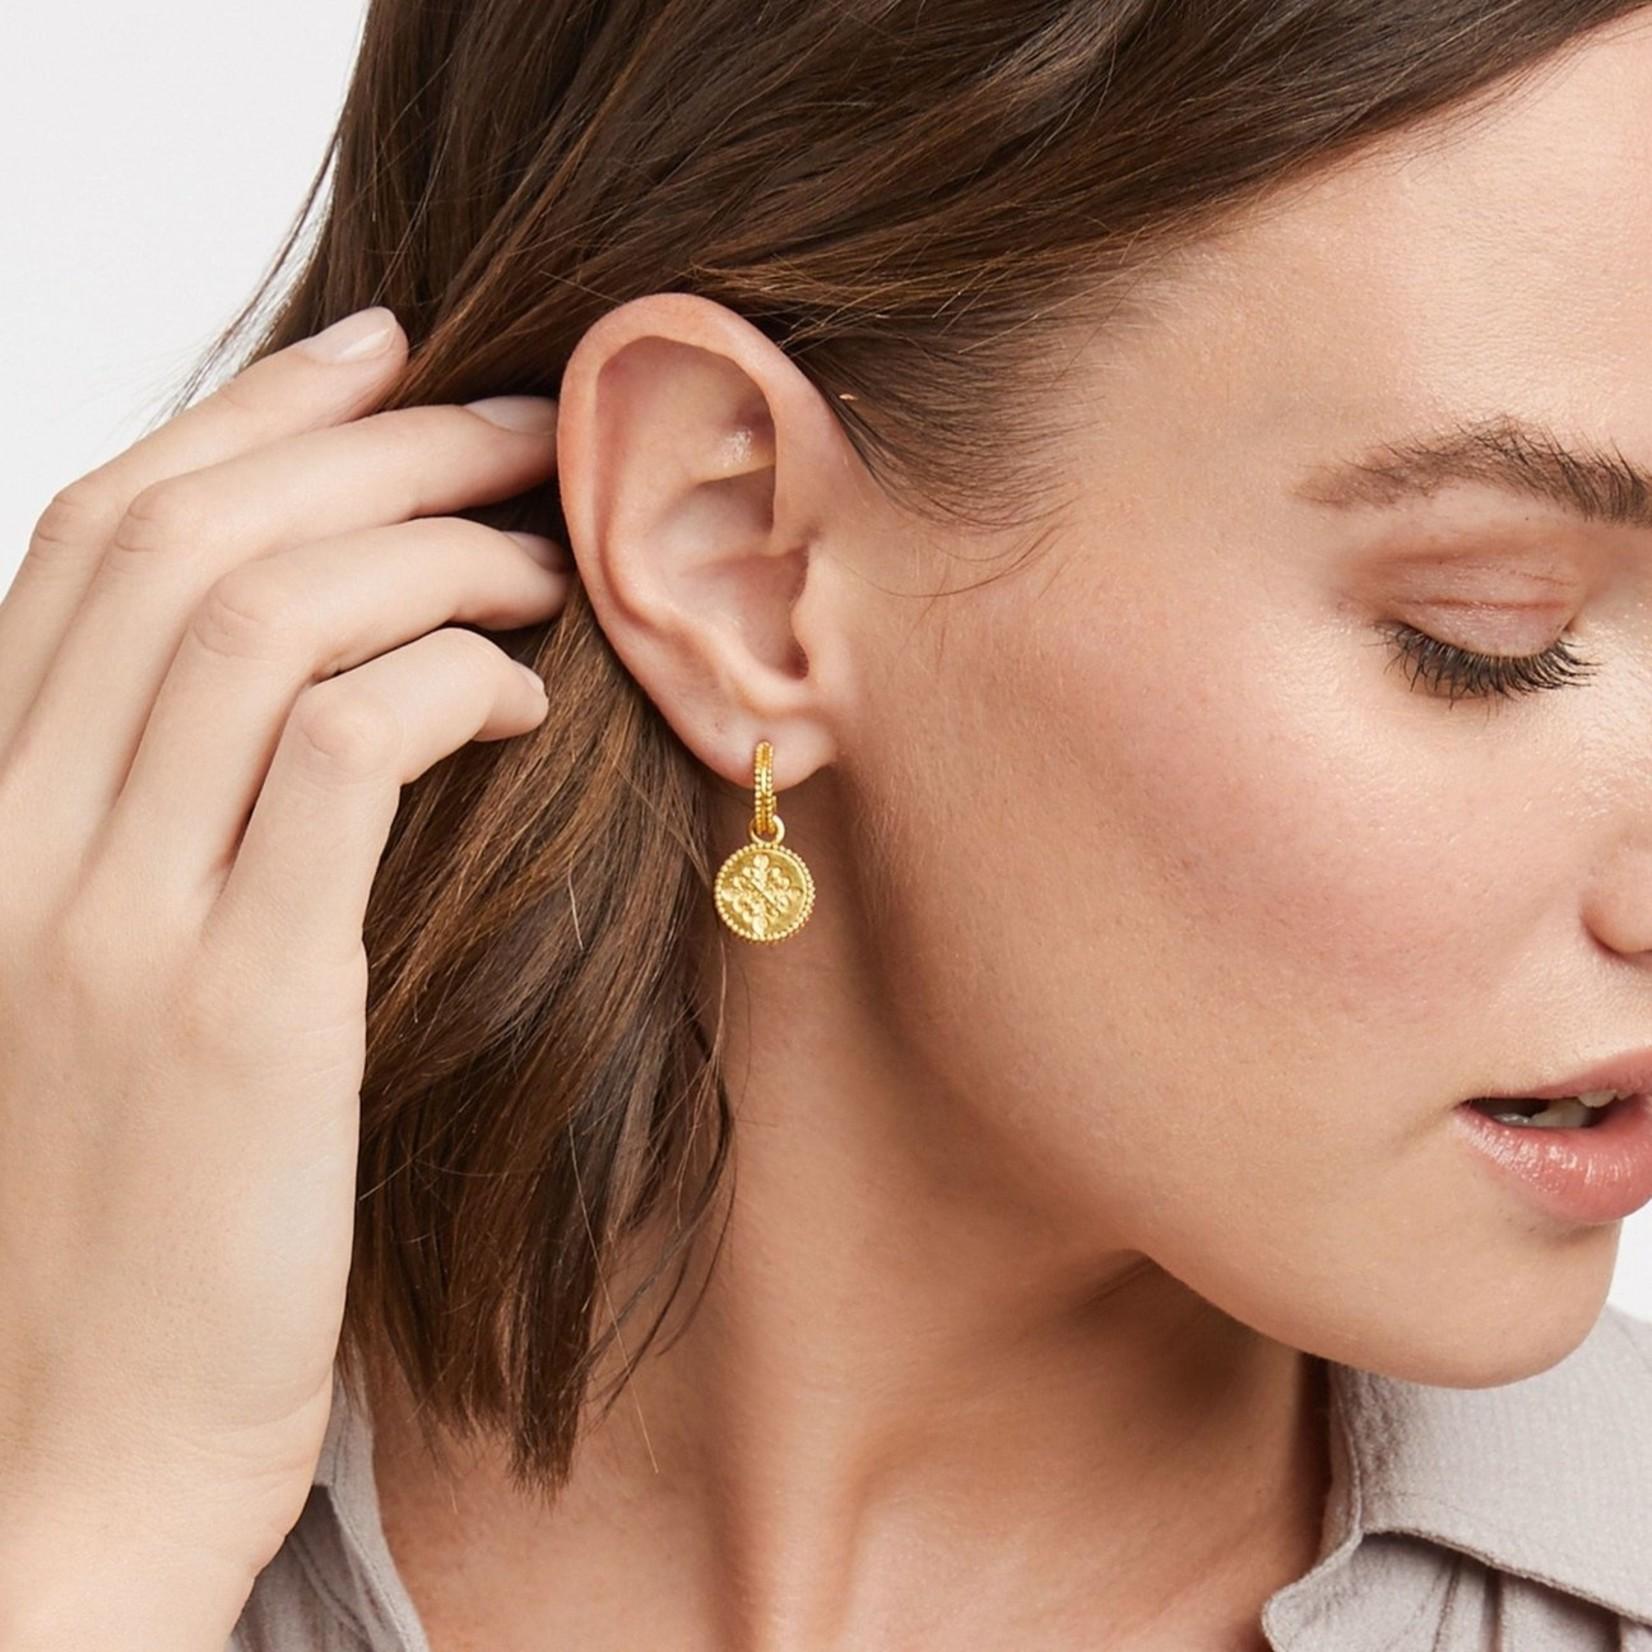 Julie Vos Fleur-de-Lis Hoop & Charm Earring - Iridescent Bahamian Blue Reversible